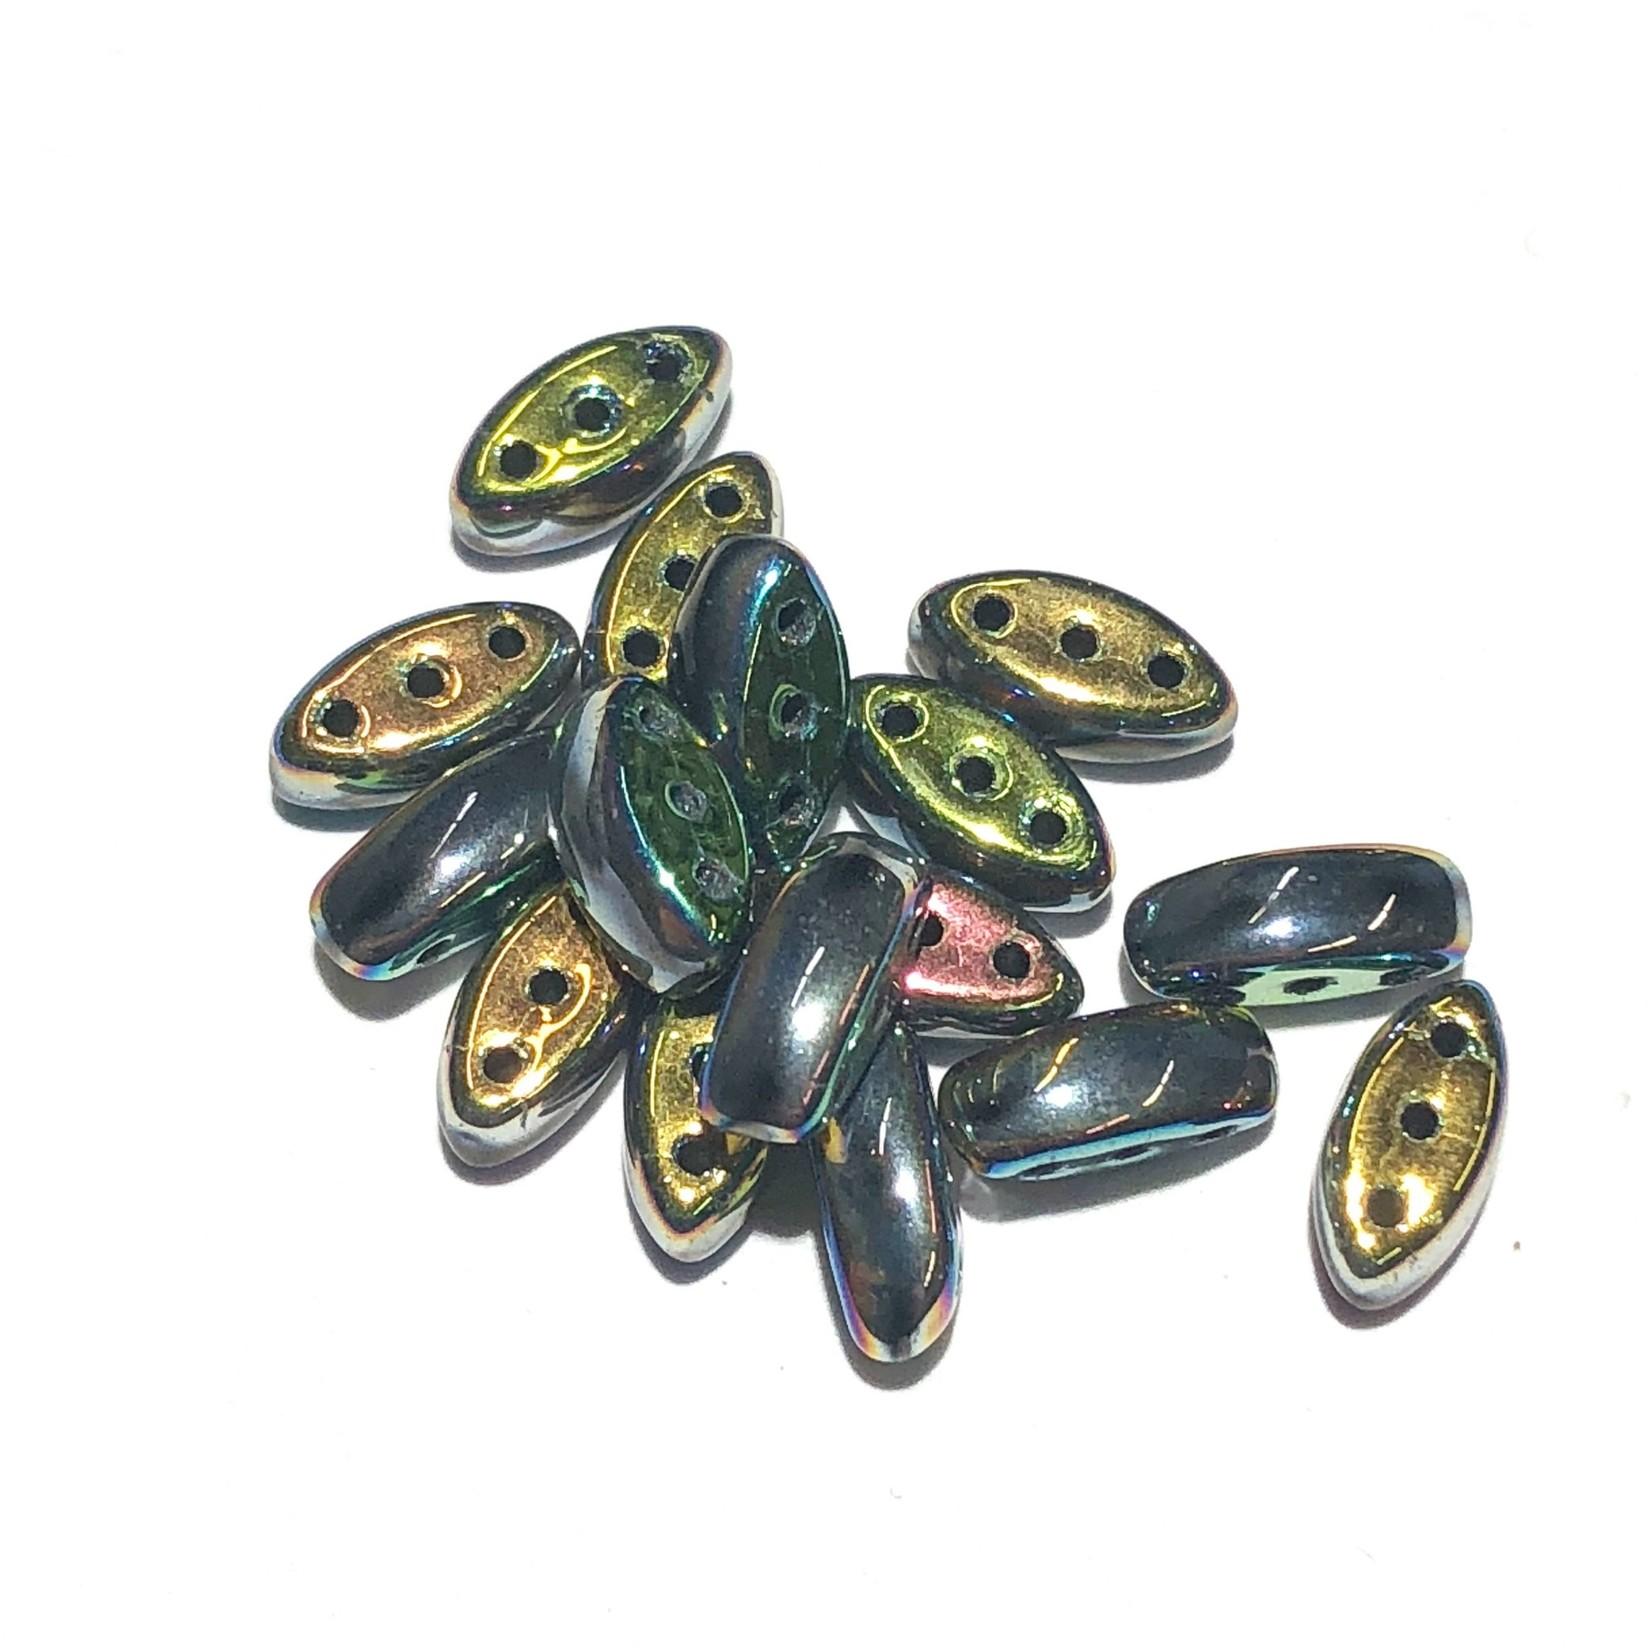 Cali Beads 3-Hole Black/Vitrail 40pcs